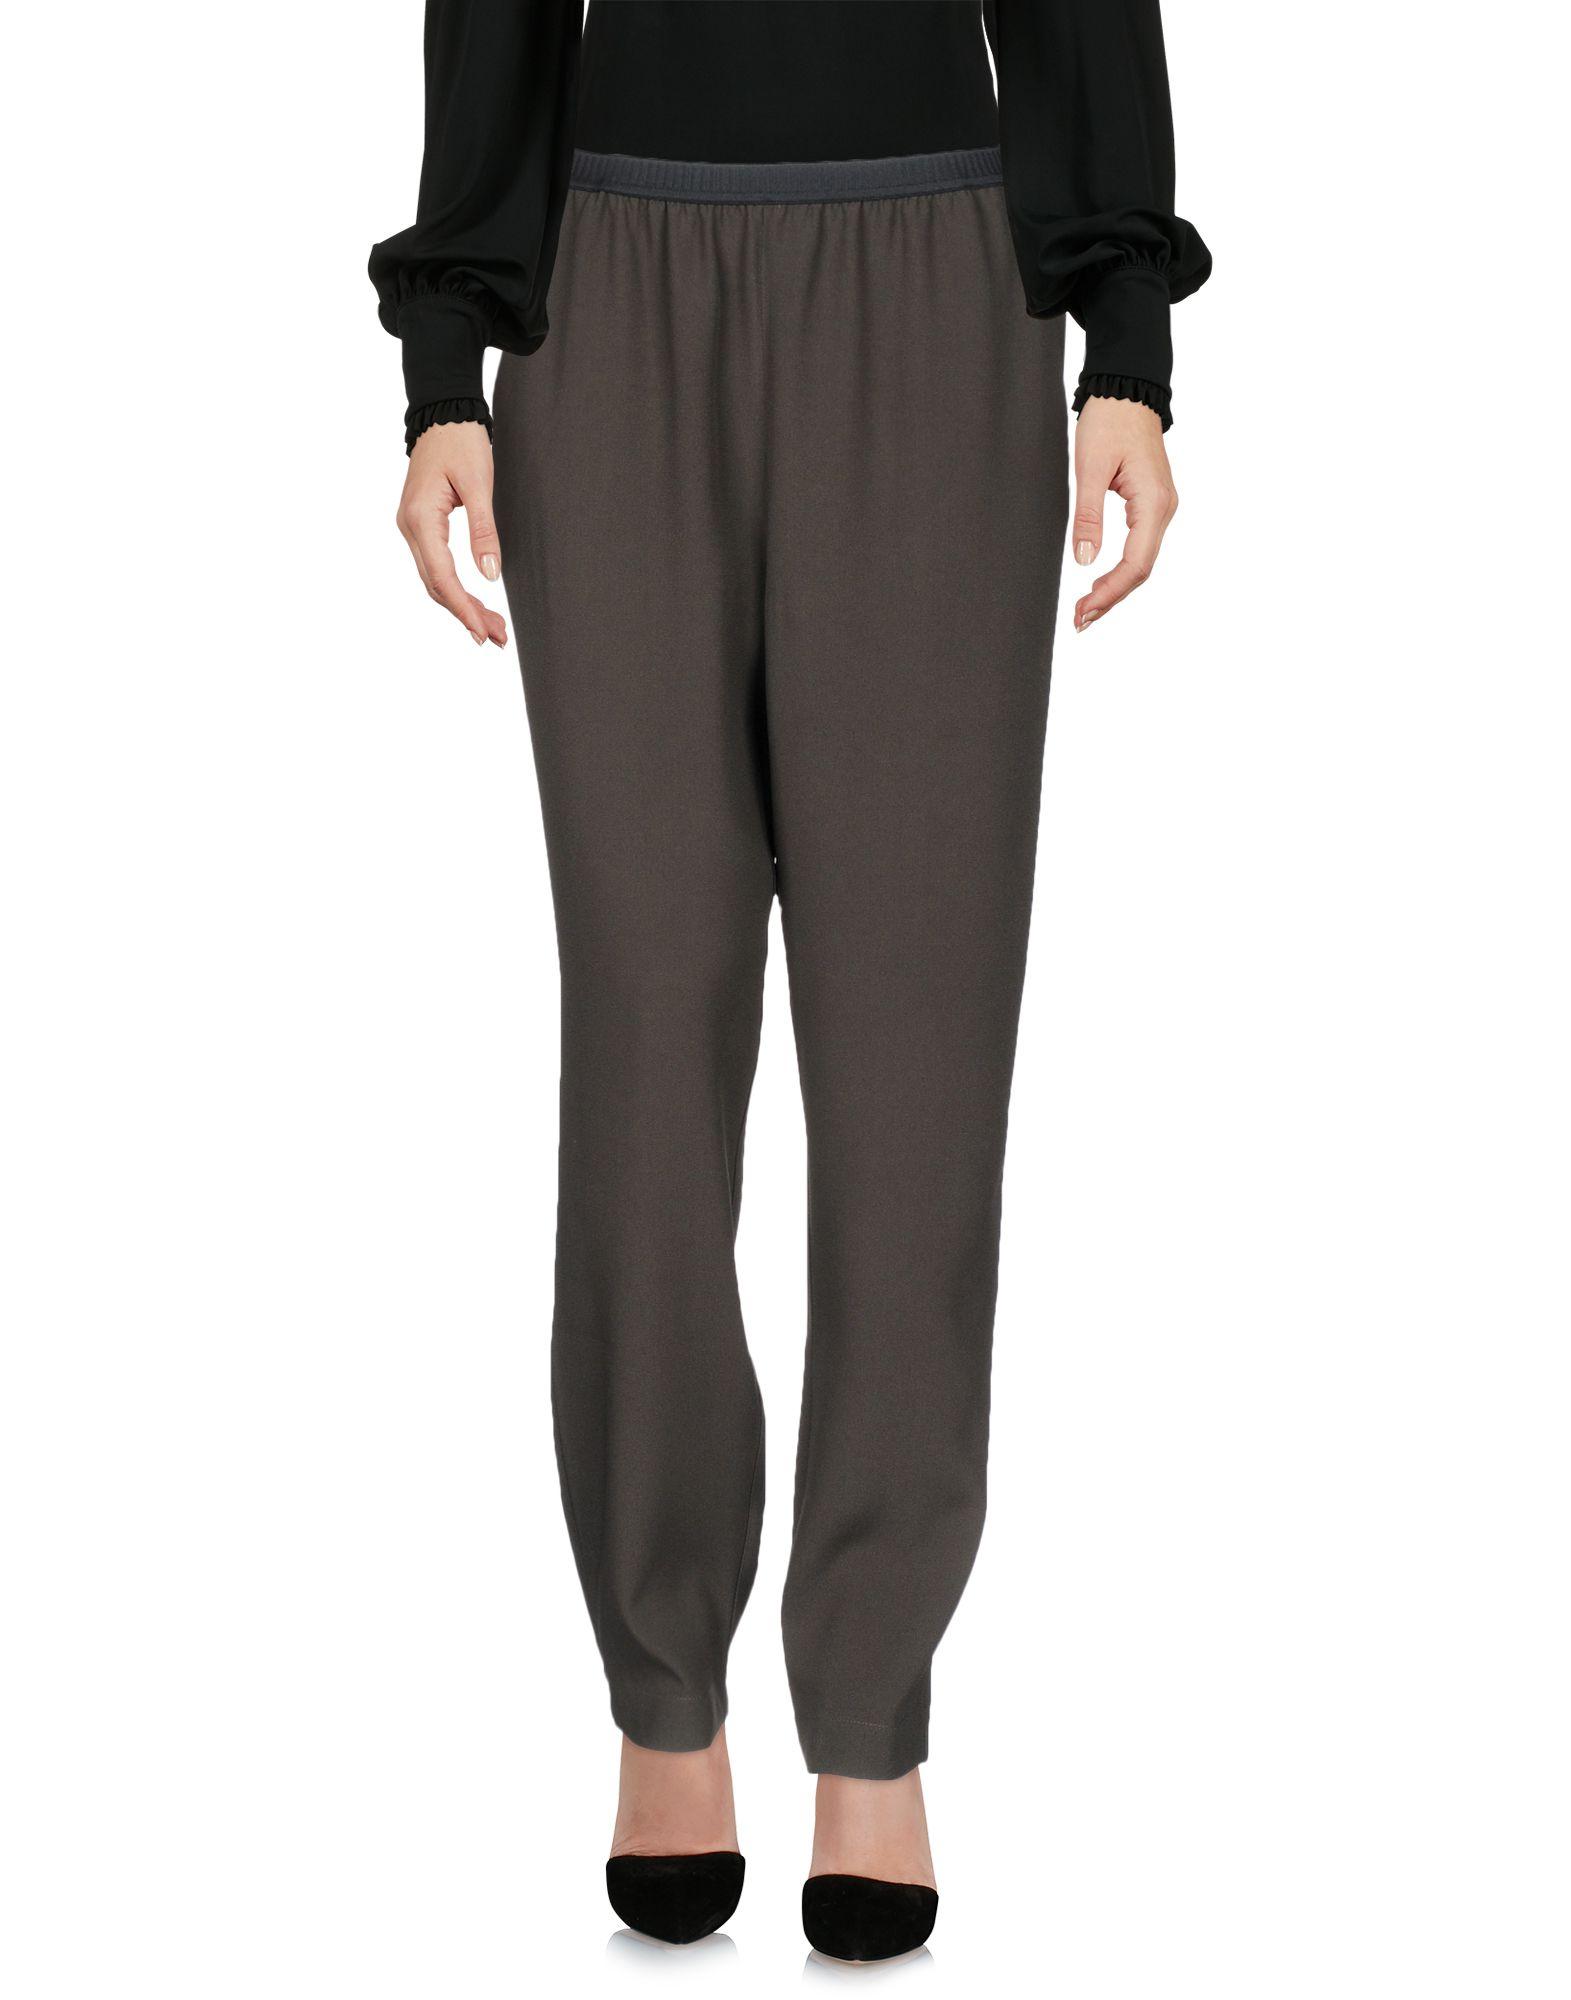 Pantalone I'm Isola Marras Donna - Acquista online su m41njAhhD